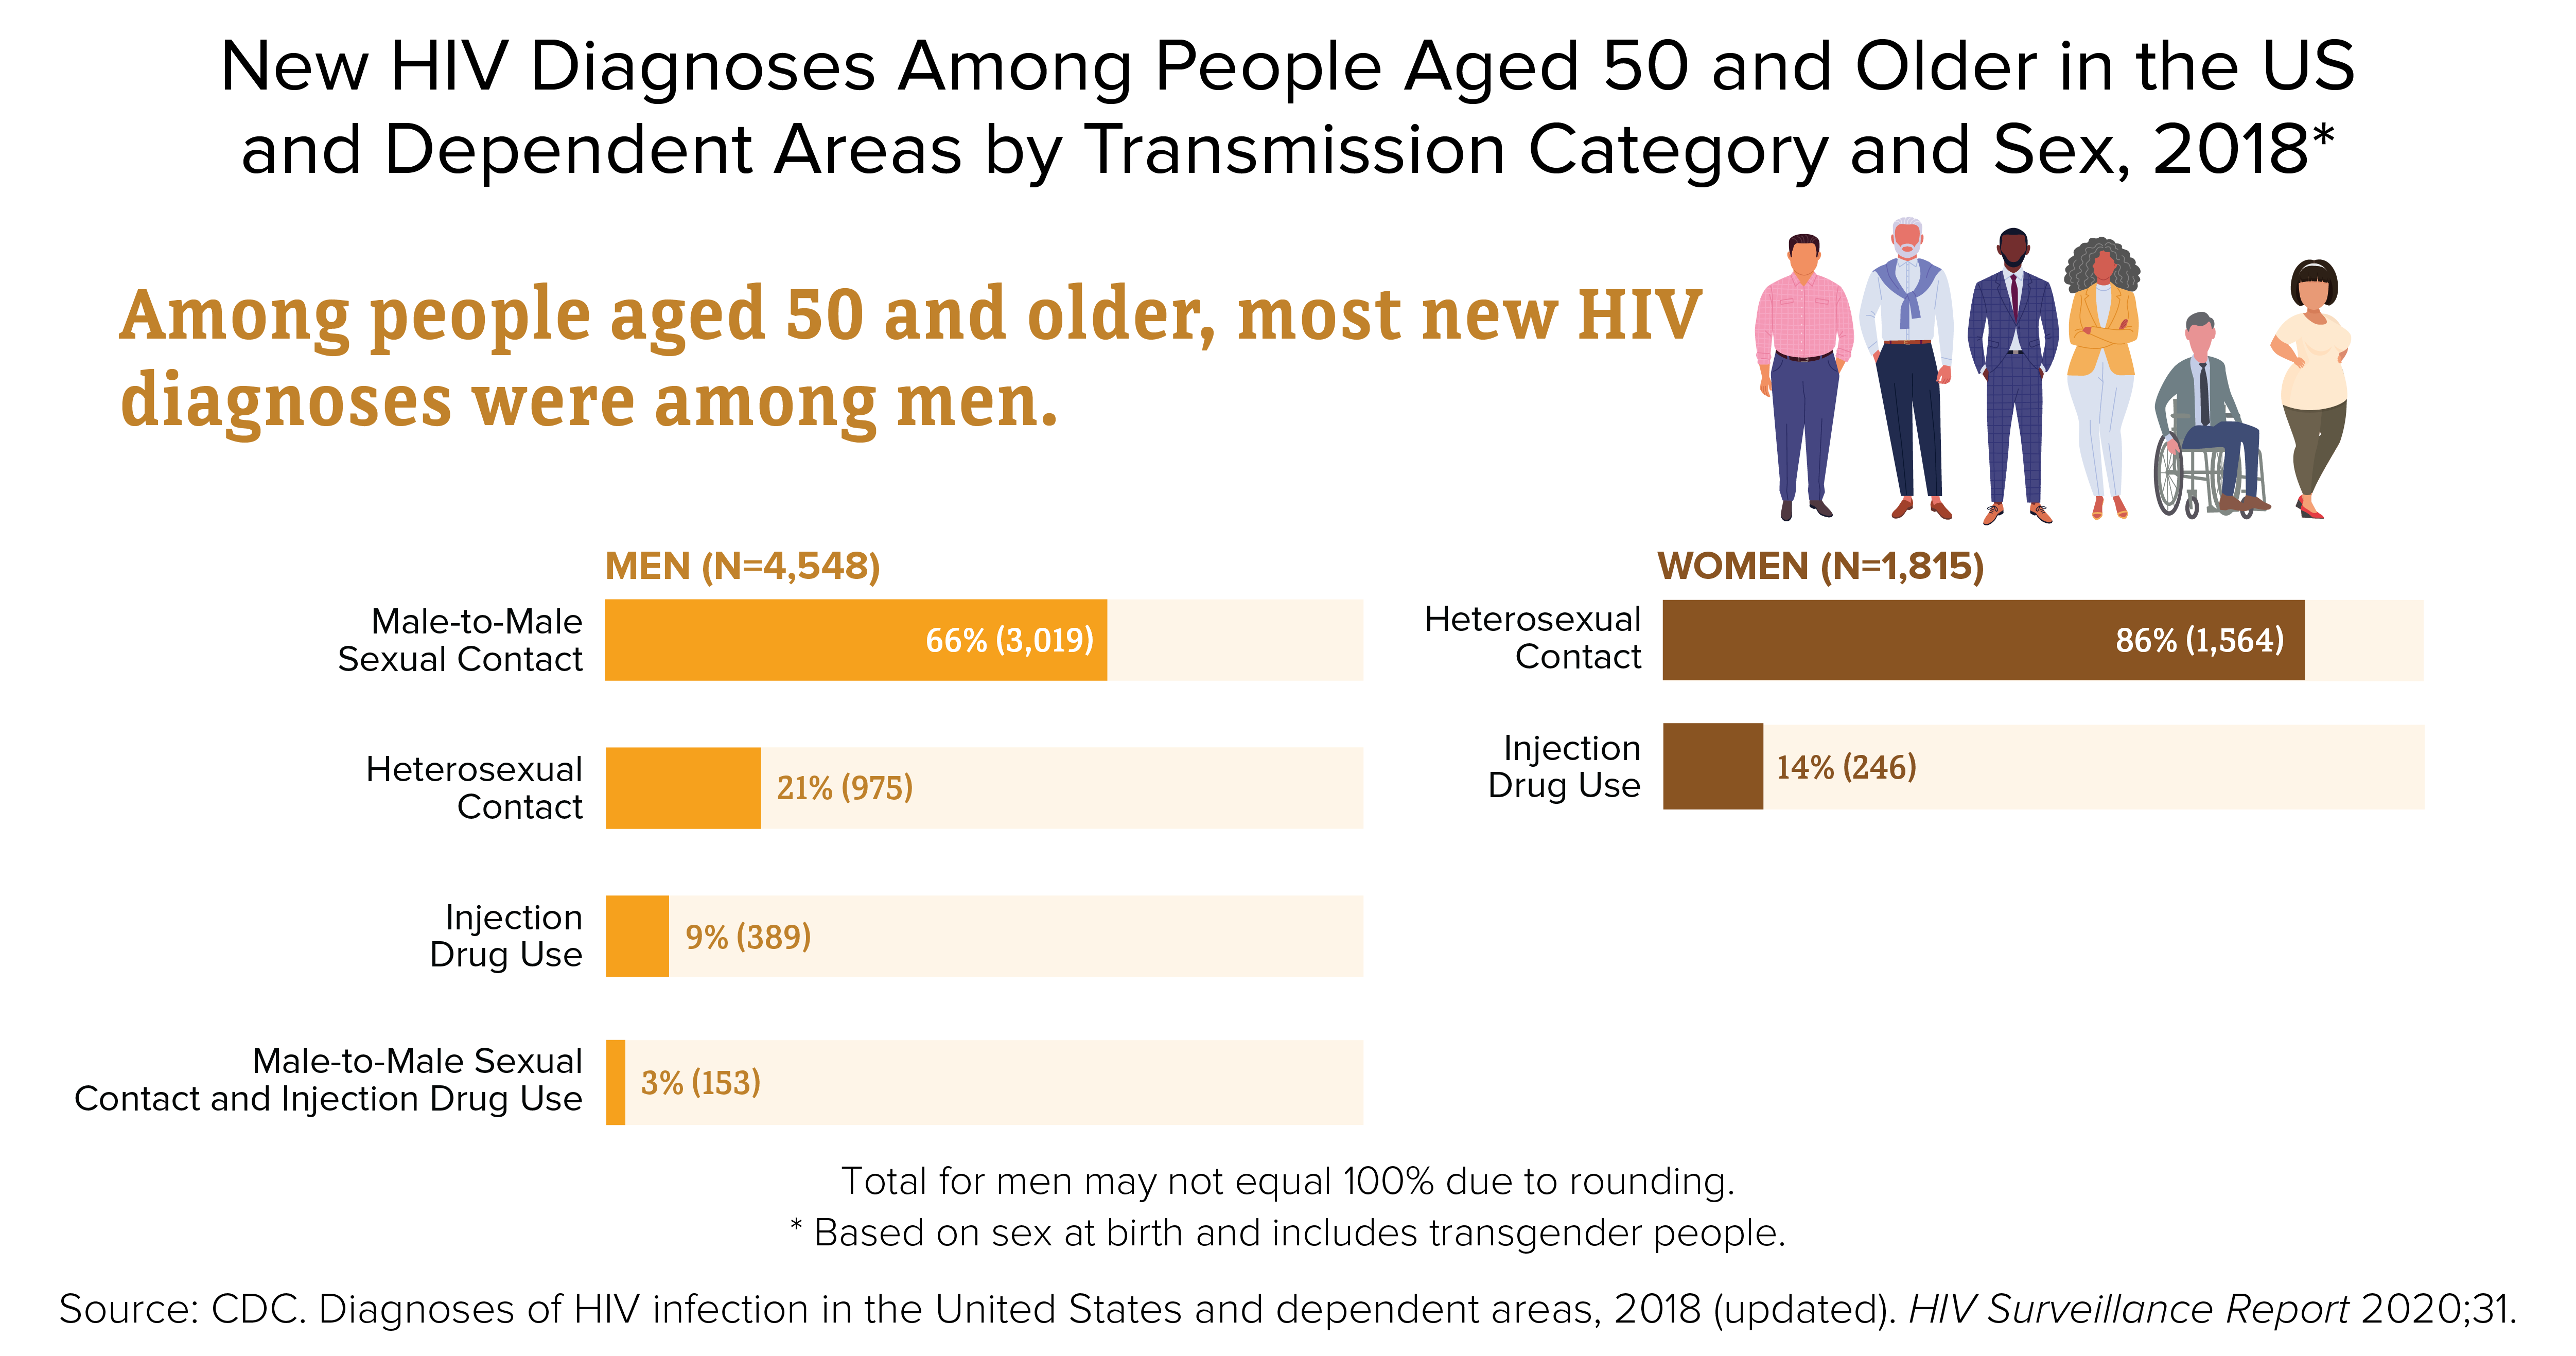 cdc-hiv-older-infographic-men-women-1200x630